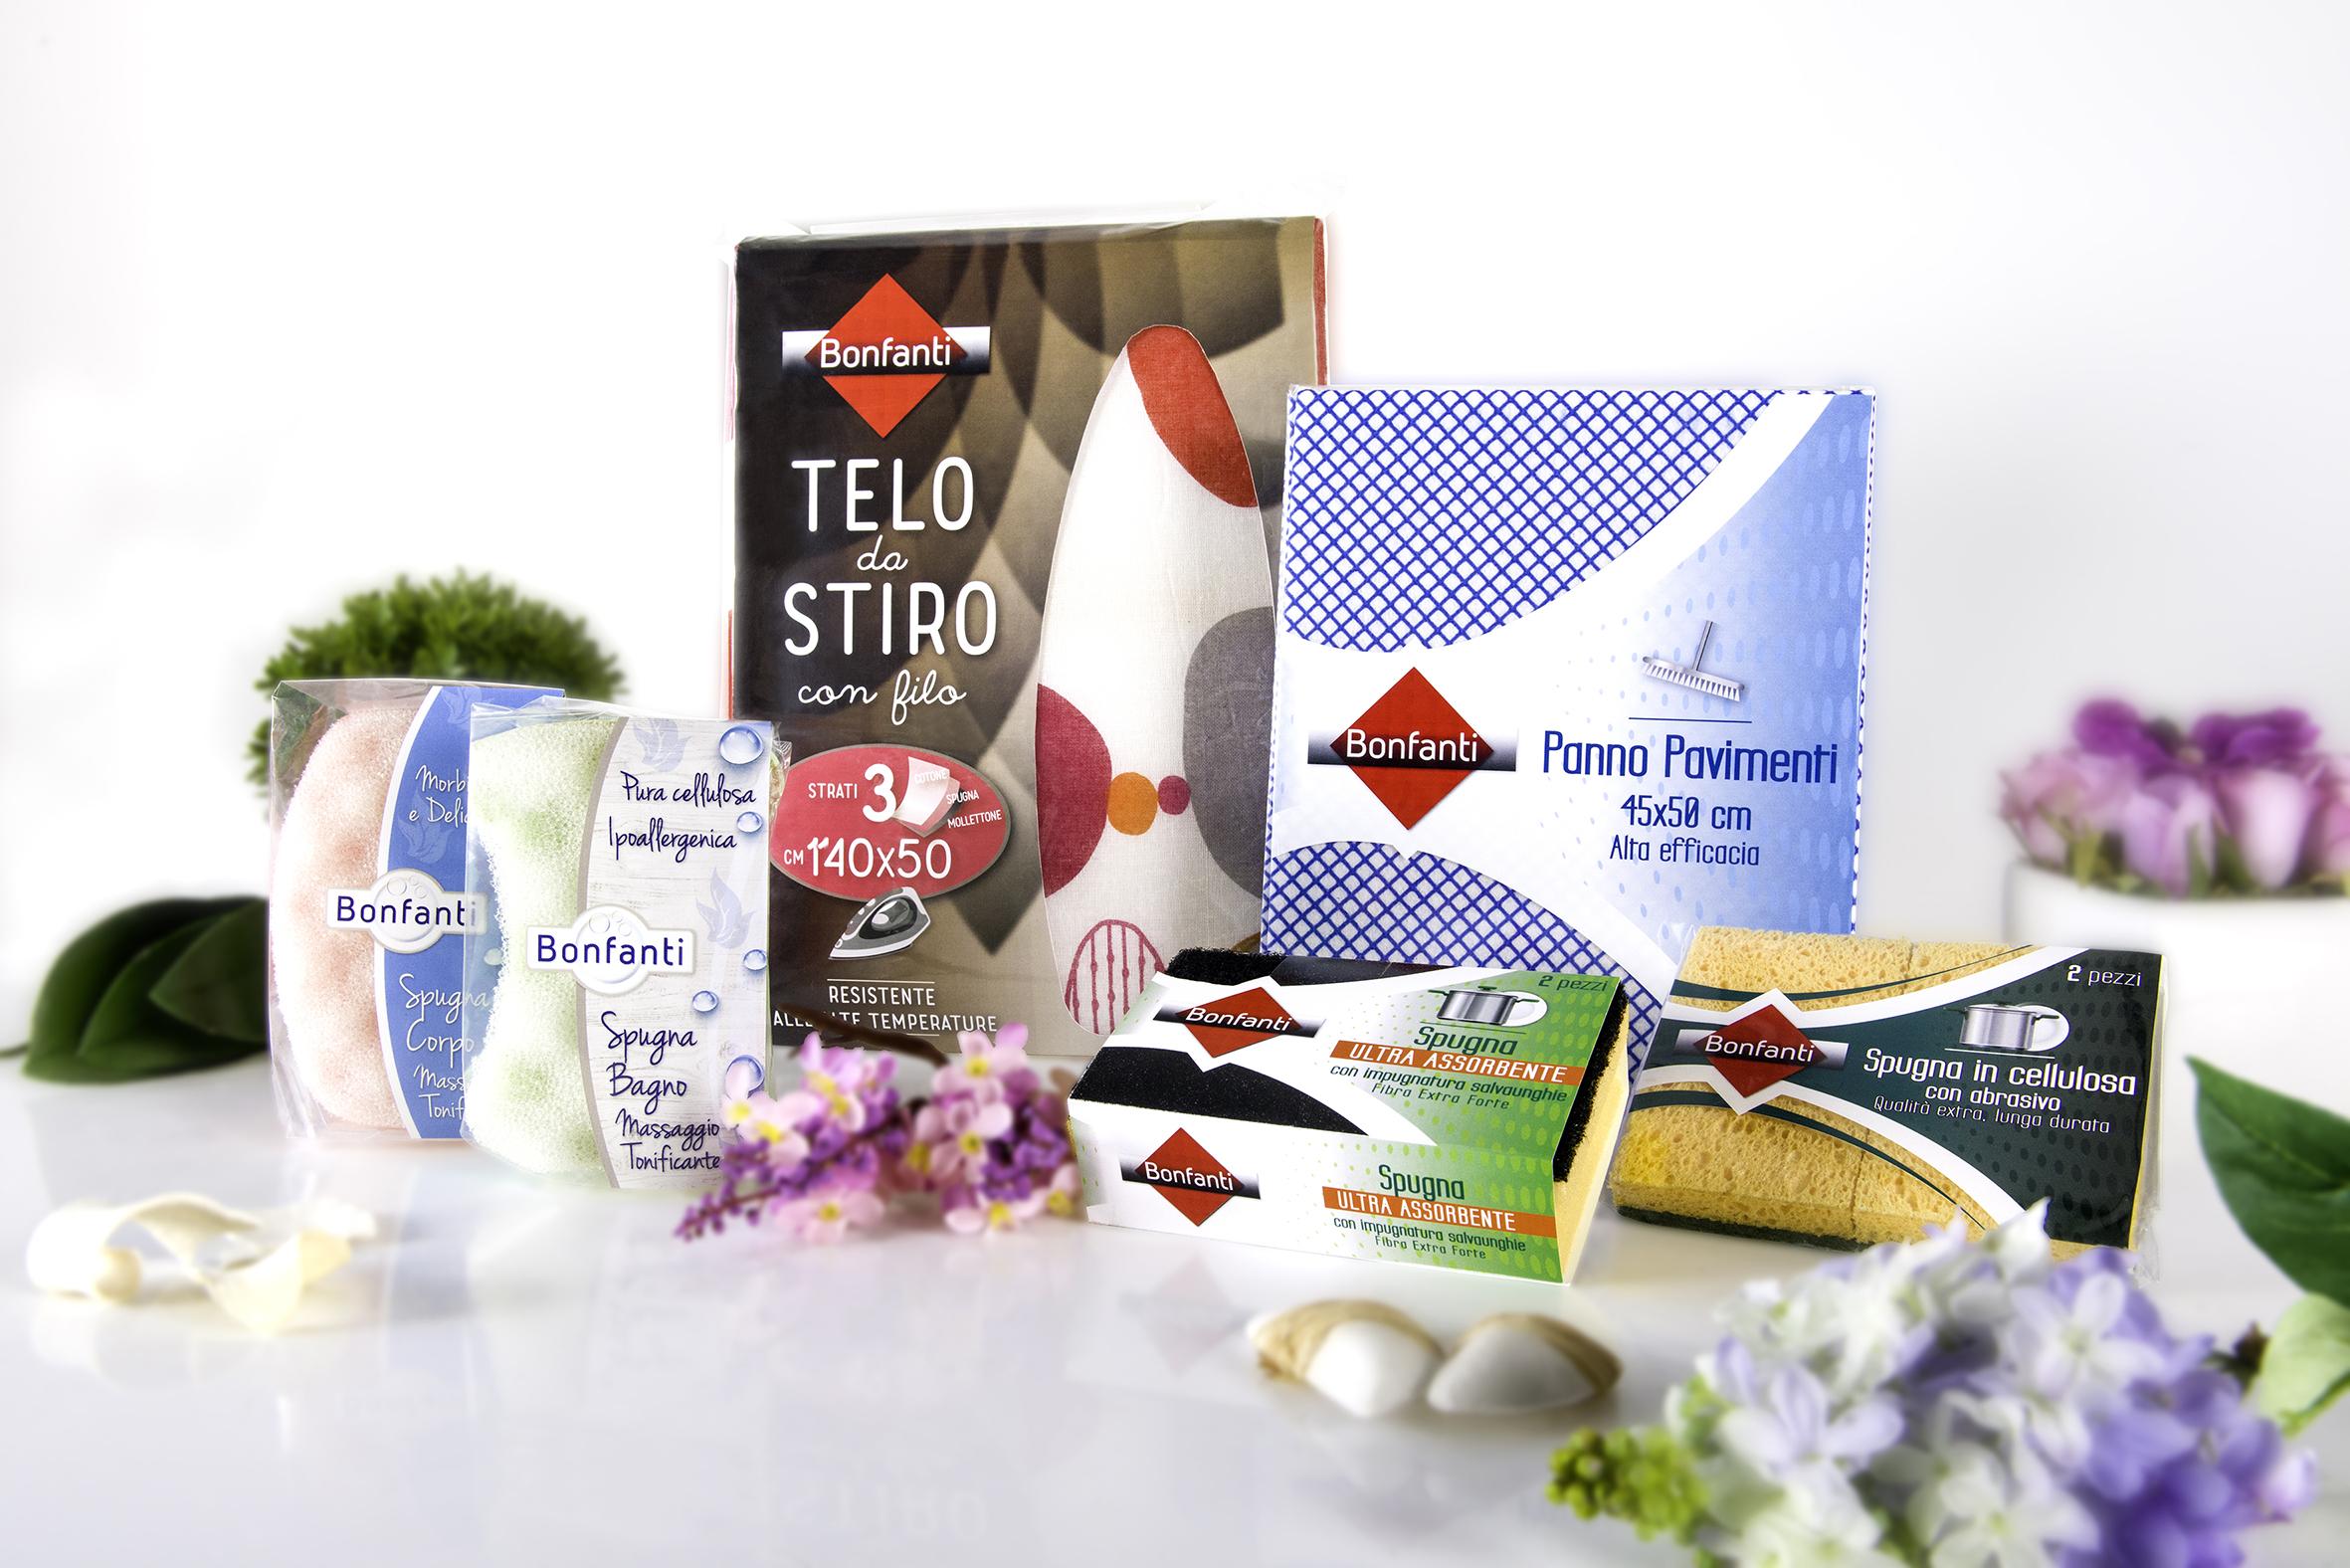 GDO-Bonfanti-Pulizia-Telo-Stiro